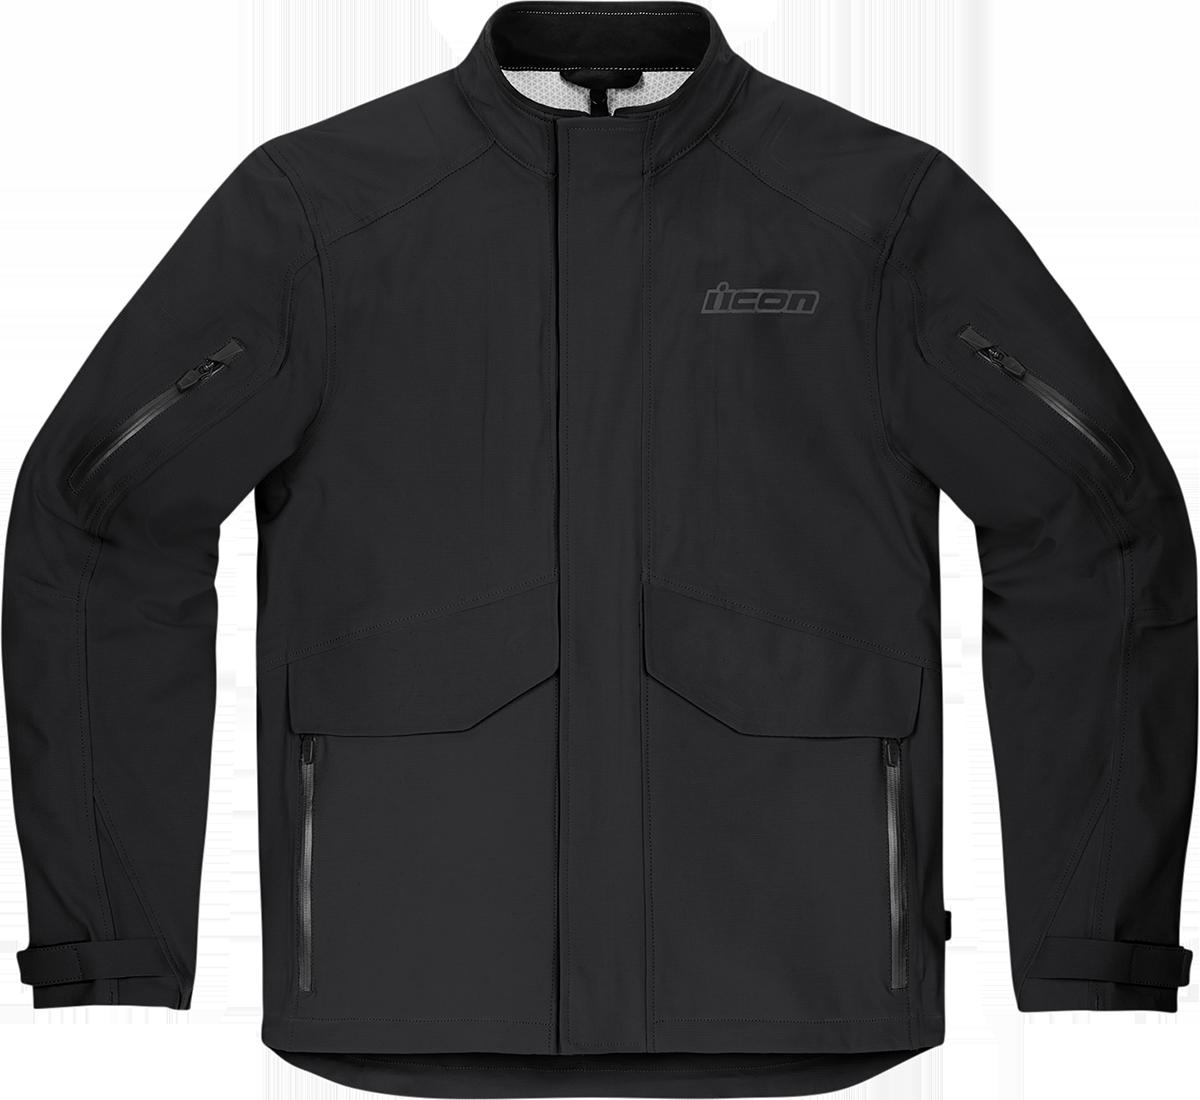 Icon Stormhawk Mens Black Textile Motorcycle Riding Street Racing Zipper Jacket